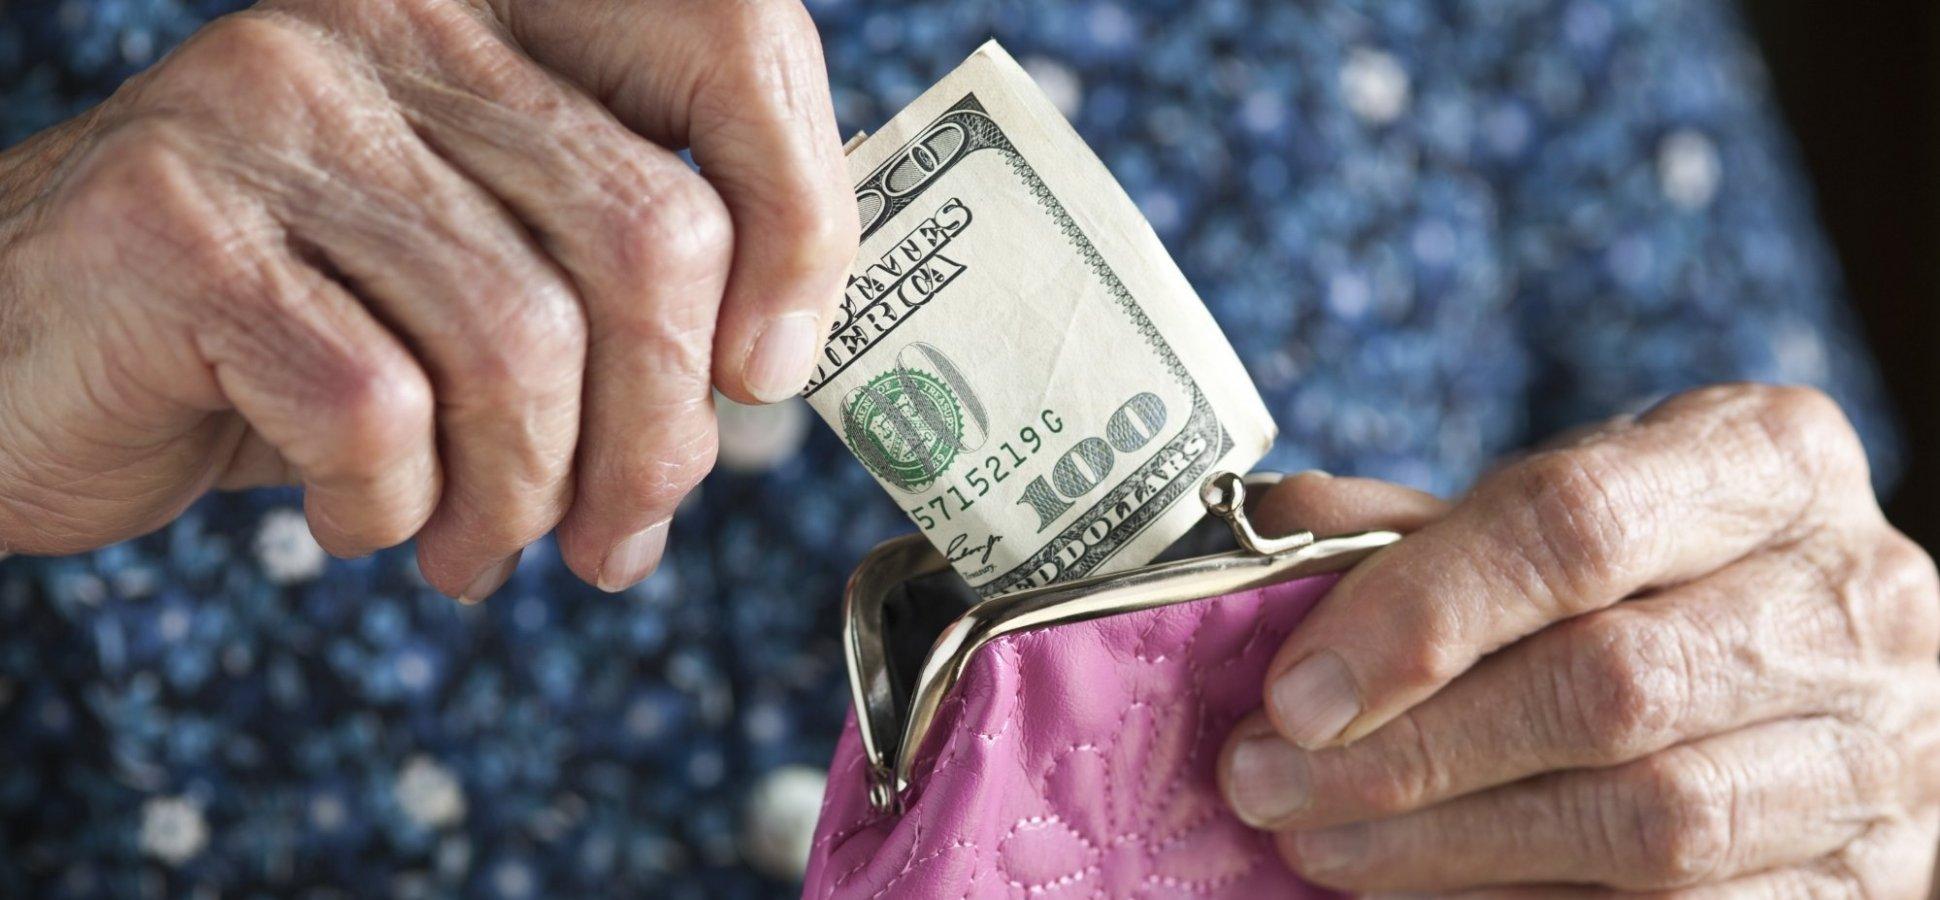 Millions of Senior Citizens Struggle to Repay Student Debt